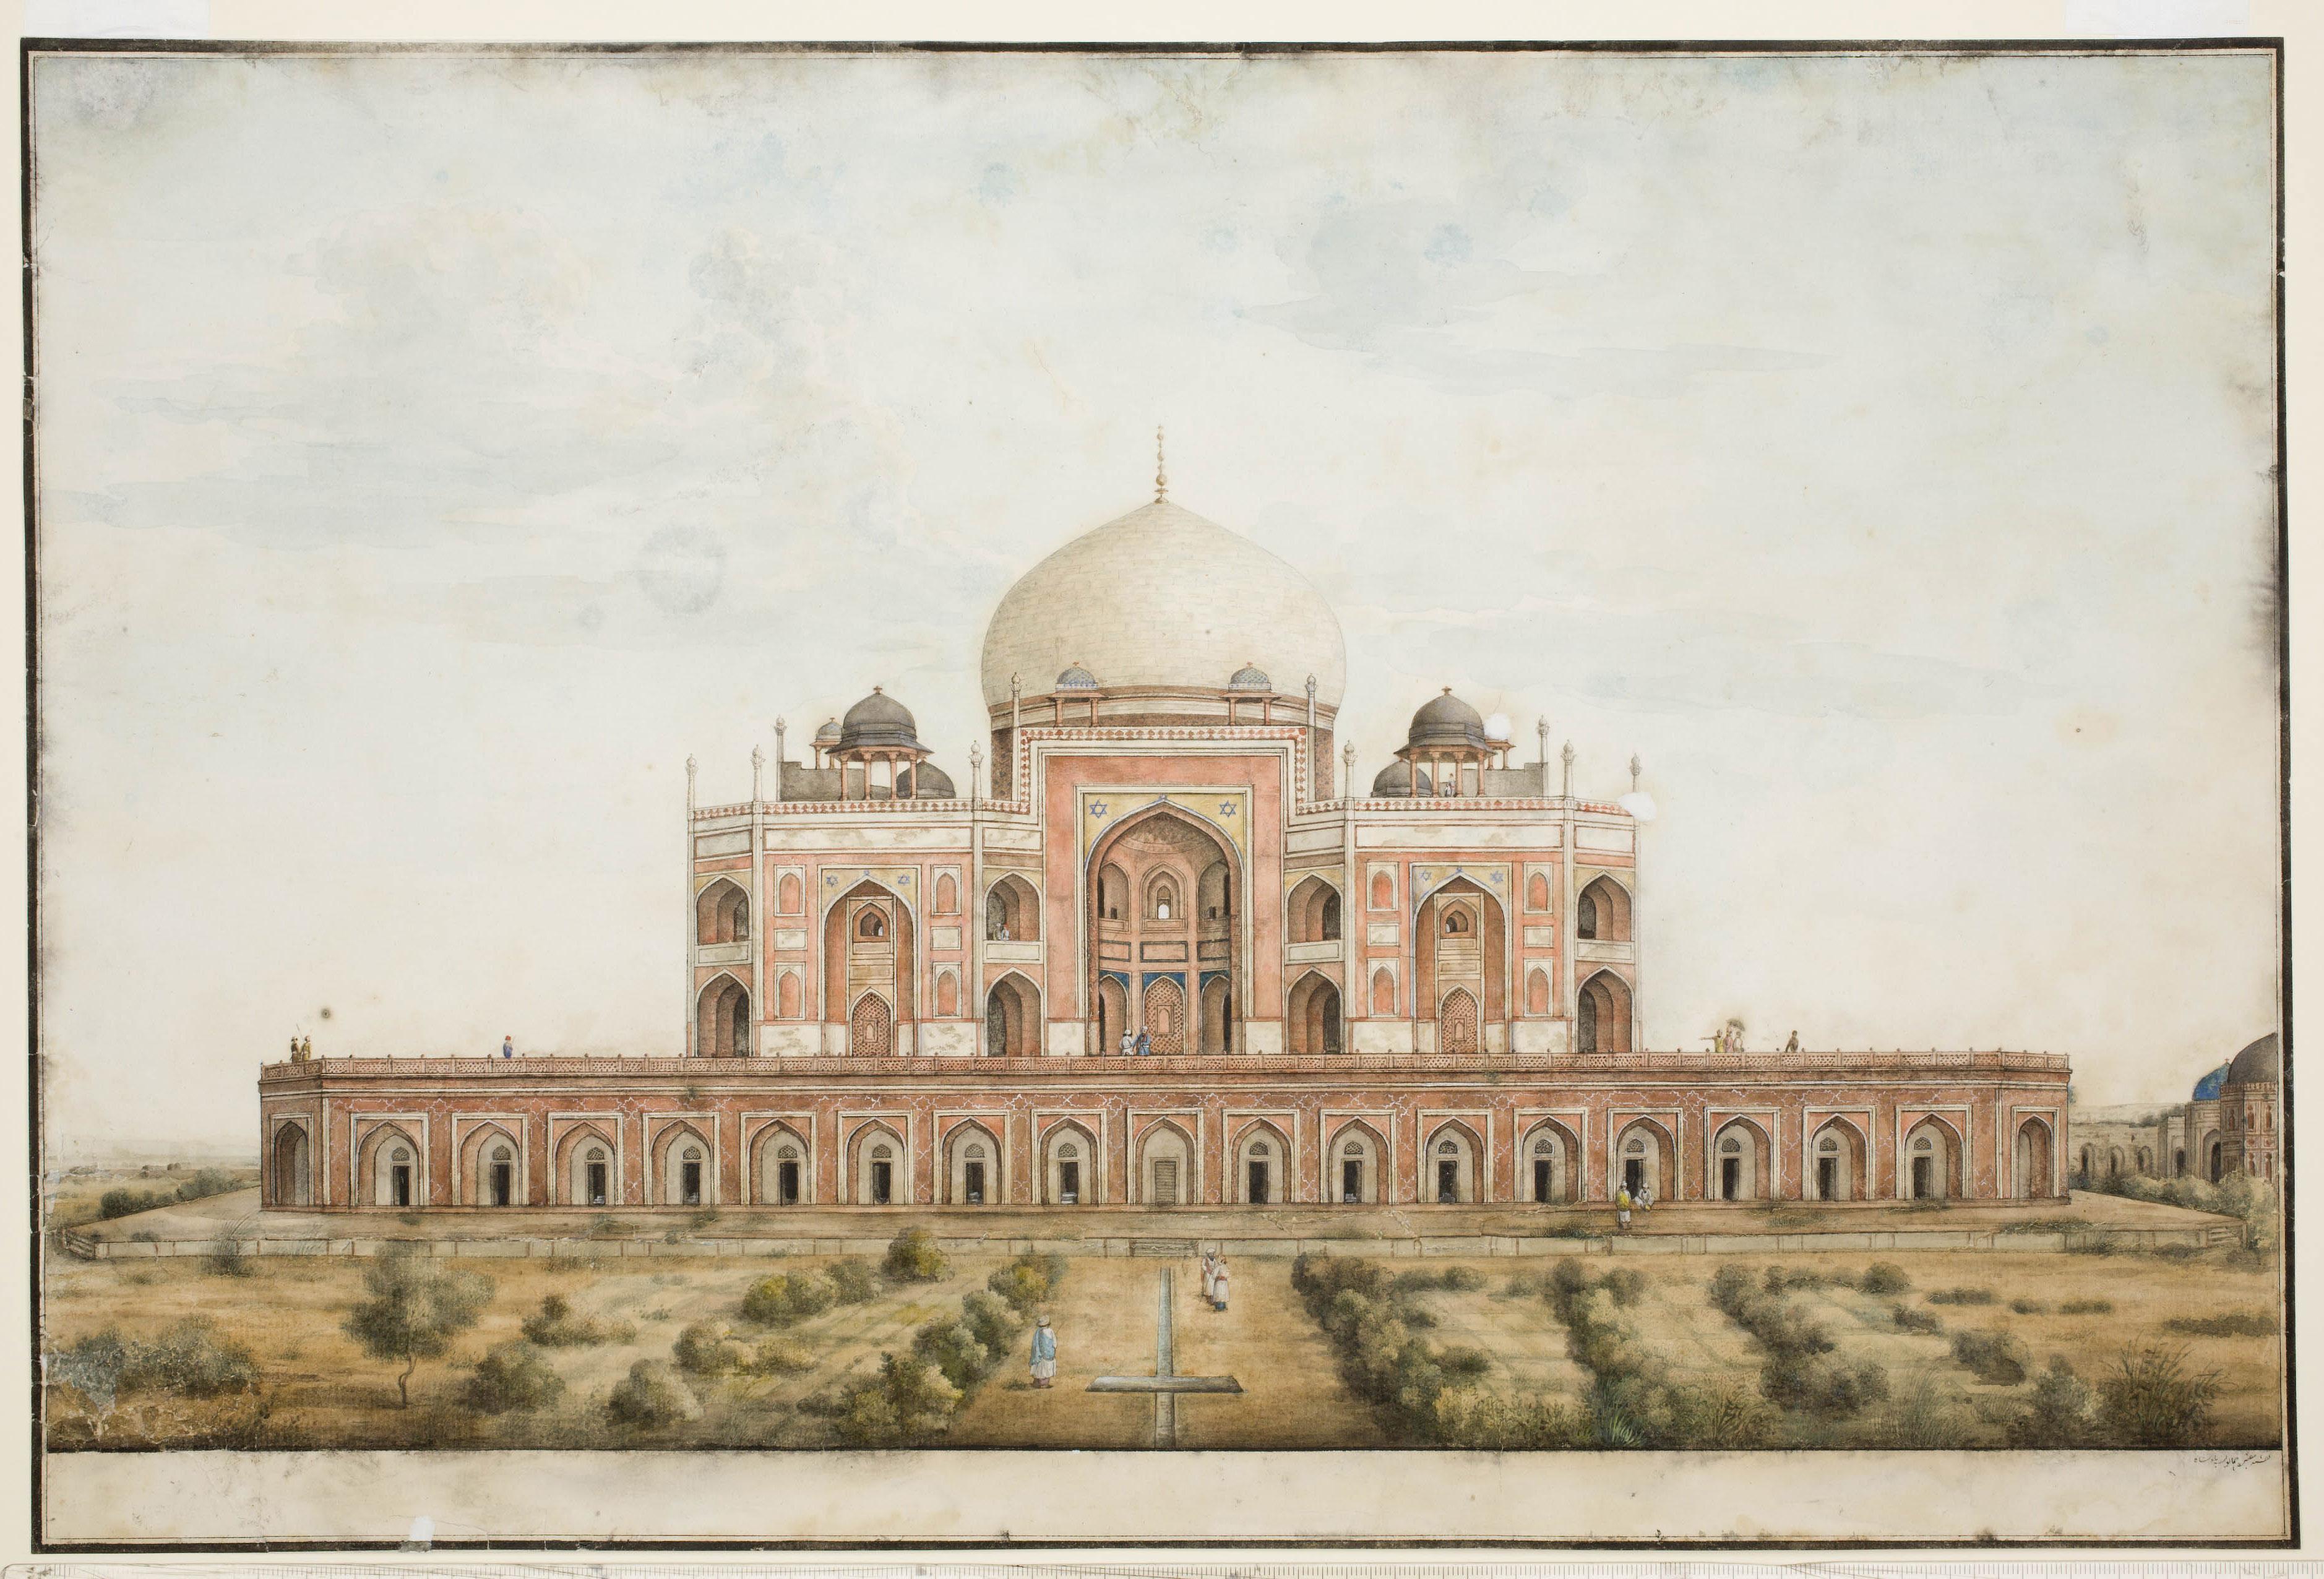 Jardins d'Orient de l'Alhambra au Taj Mahal ©zeitudeprofondelemag.com